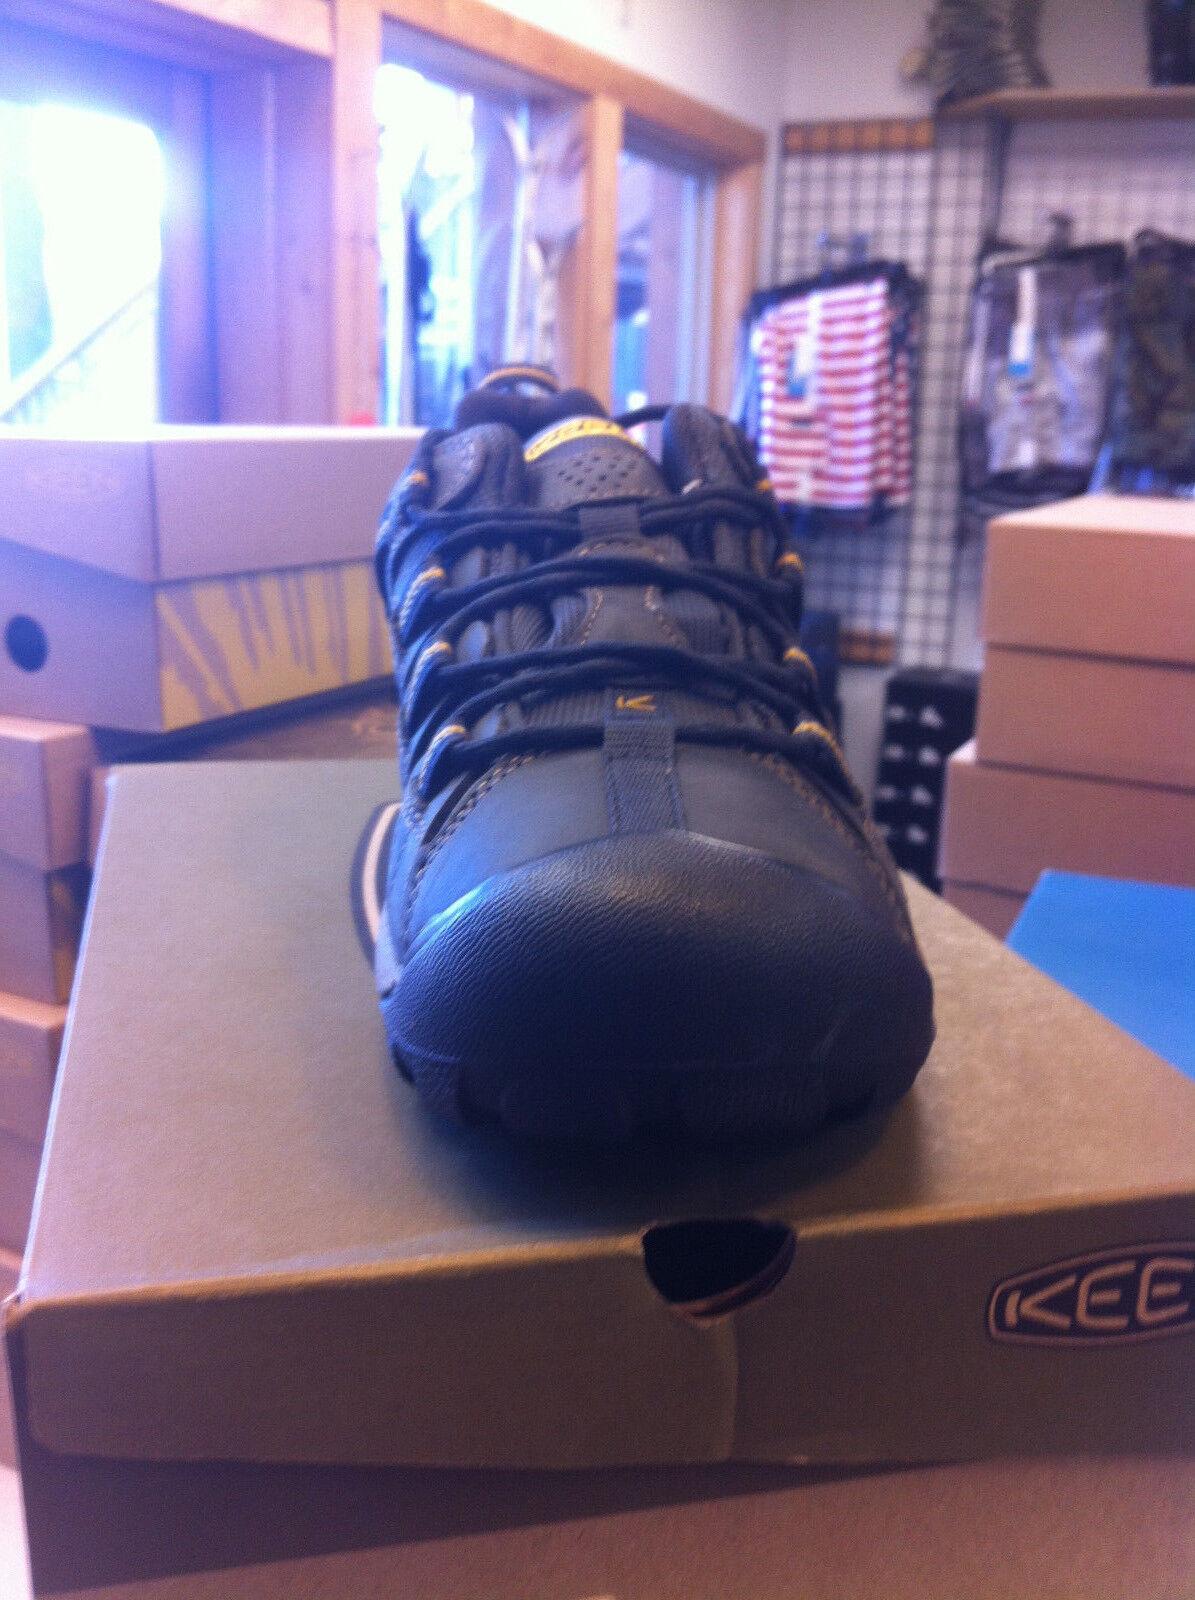 Para Hombres Color Zapato impermeable Keen Targhee II II II Raven tamaño nos 8 3af1f5